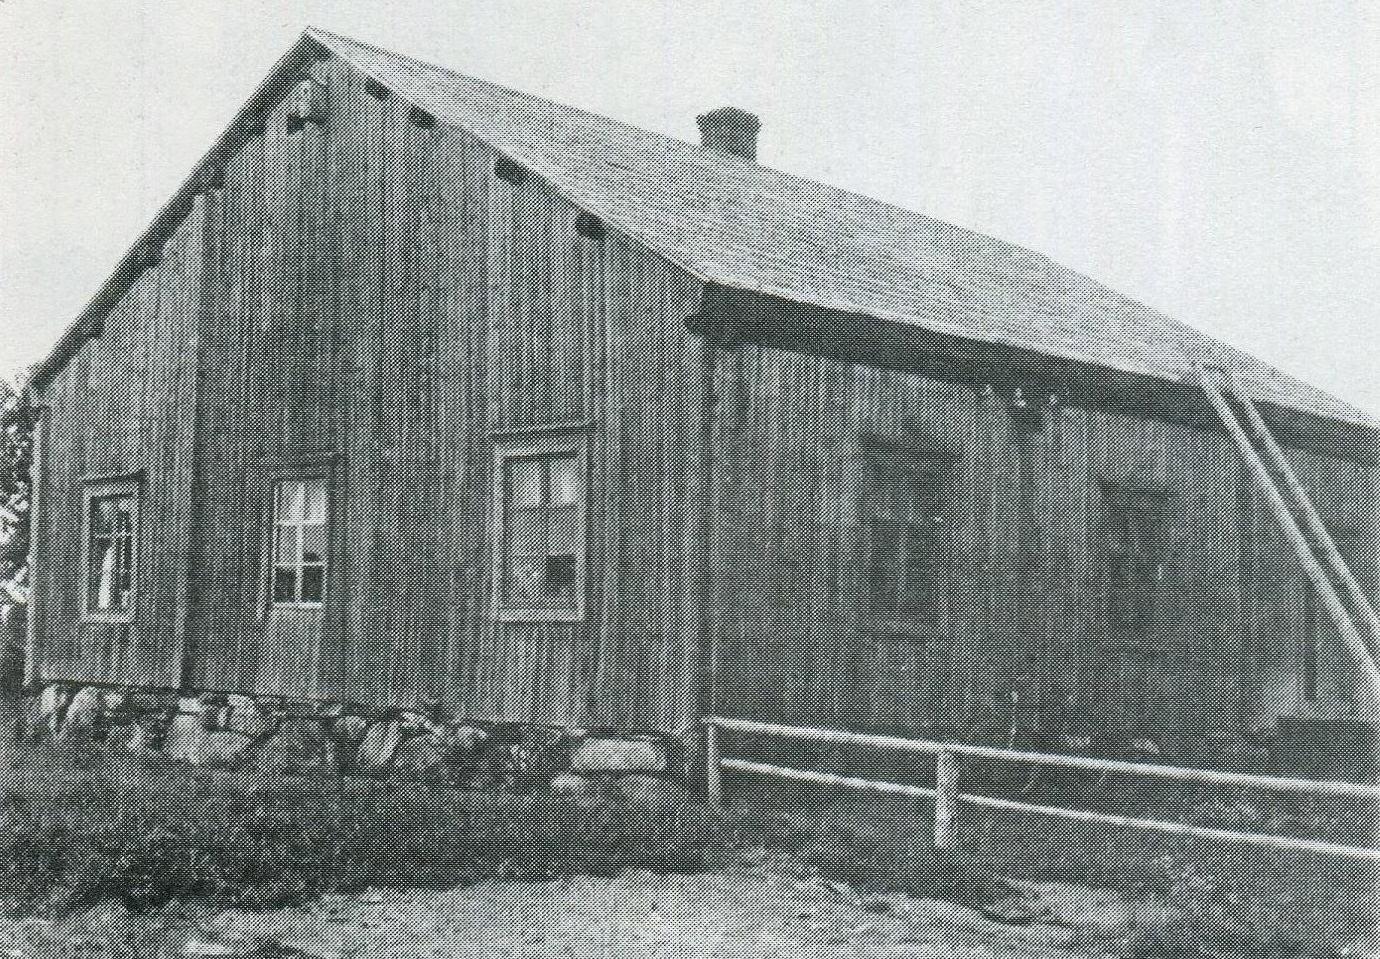 Alperin Matintupa eli Vanhatupa 1949 - purettu 1952